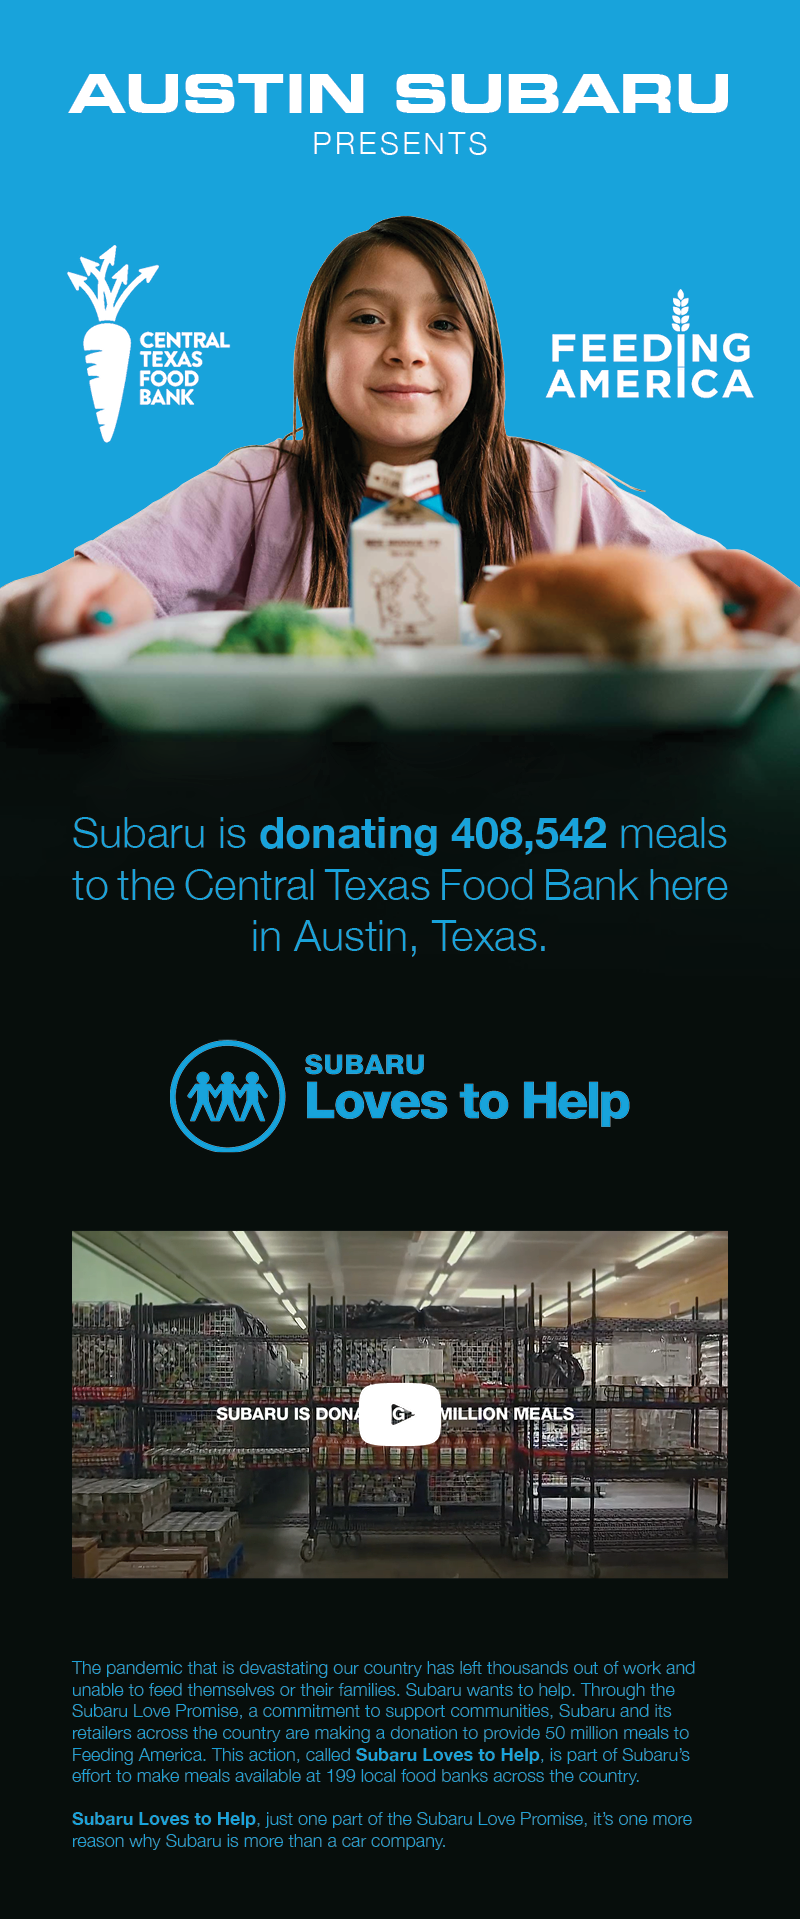 Austin Subaru and Feeding America